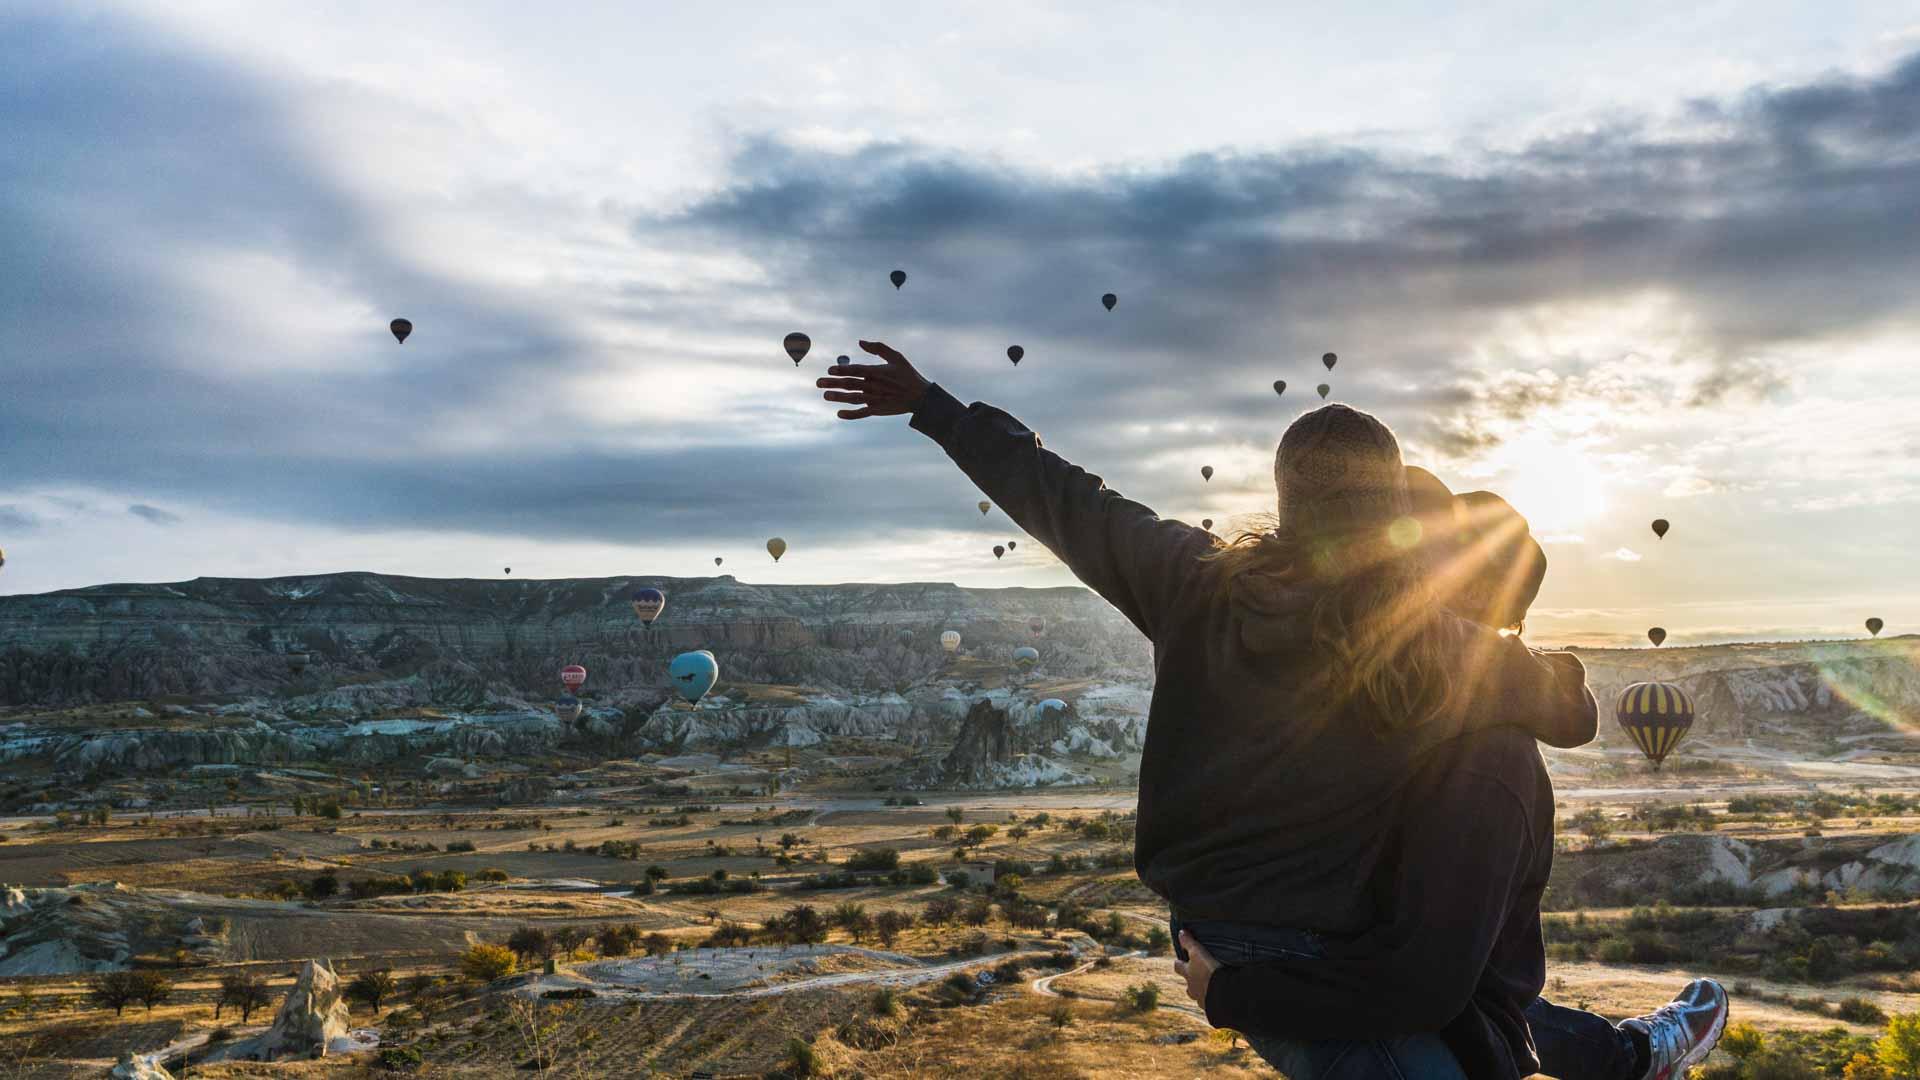 SerialHikers stop autostop world monde tour hitchhiking aventure adventure alternative travel voyage sans avion no fly Cappadocia cappadoce turquie turkey